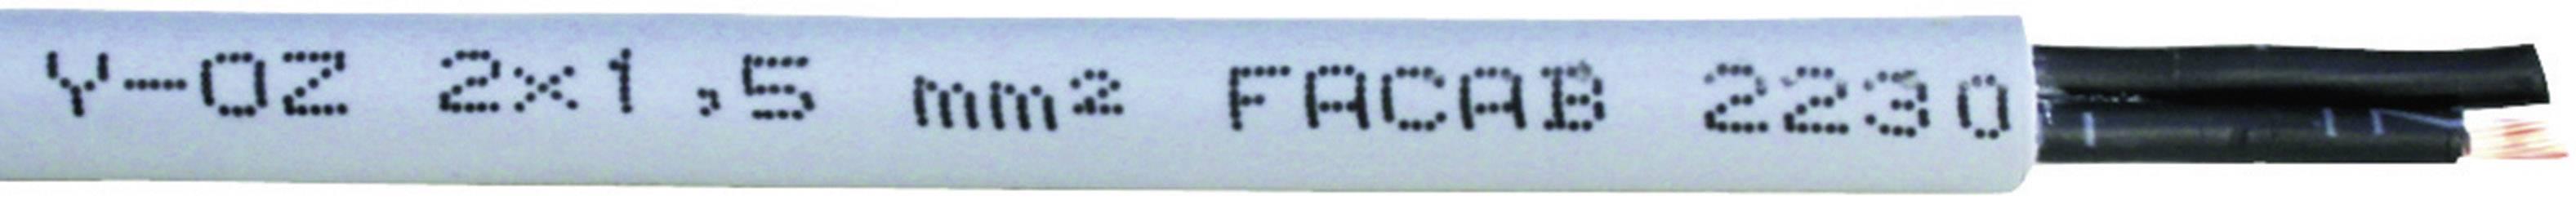 Riadiaci kábel Faber Kabel YSLY-OZ 030642, 2 x 0.50 mm², vonkajší Ø 4.80 mm, 500 V, metrový tovar, sivá